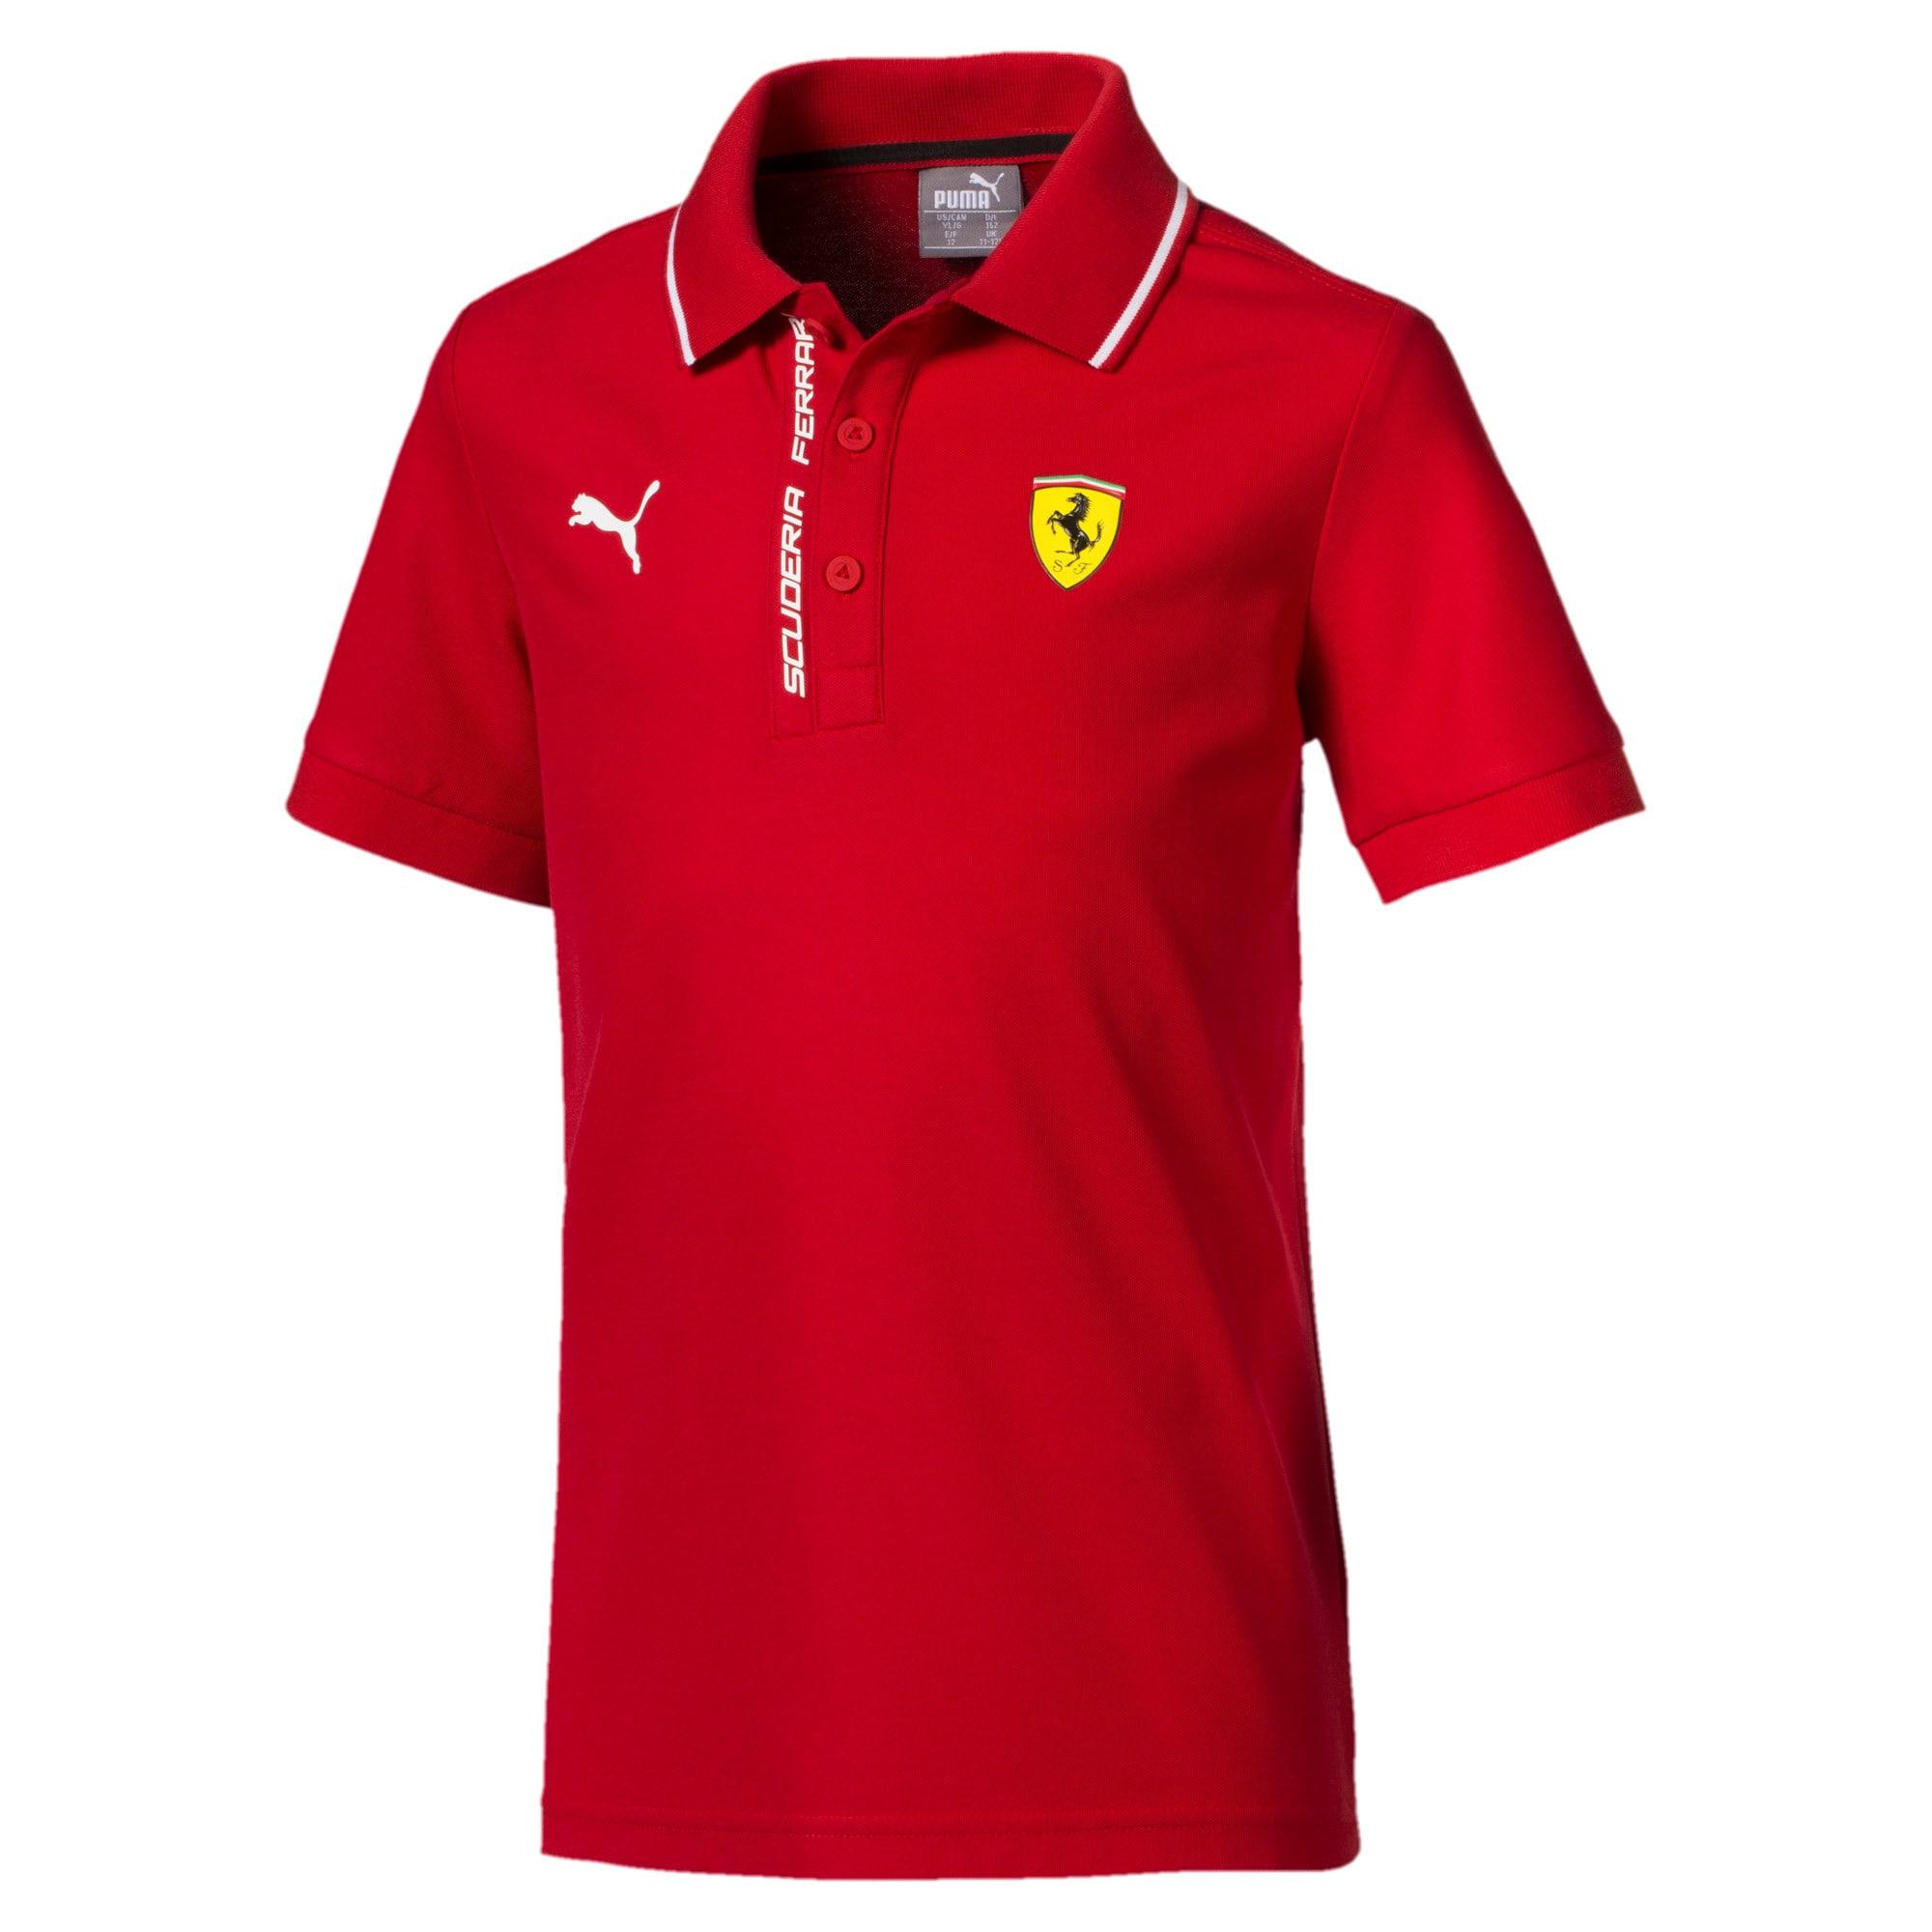 Thumbnail 1 of Ferrari Kids' Polo Shirt, Rosso Corsa, medium